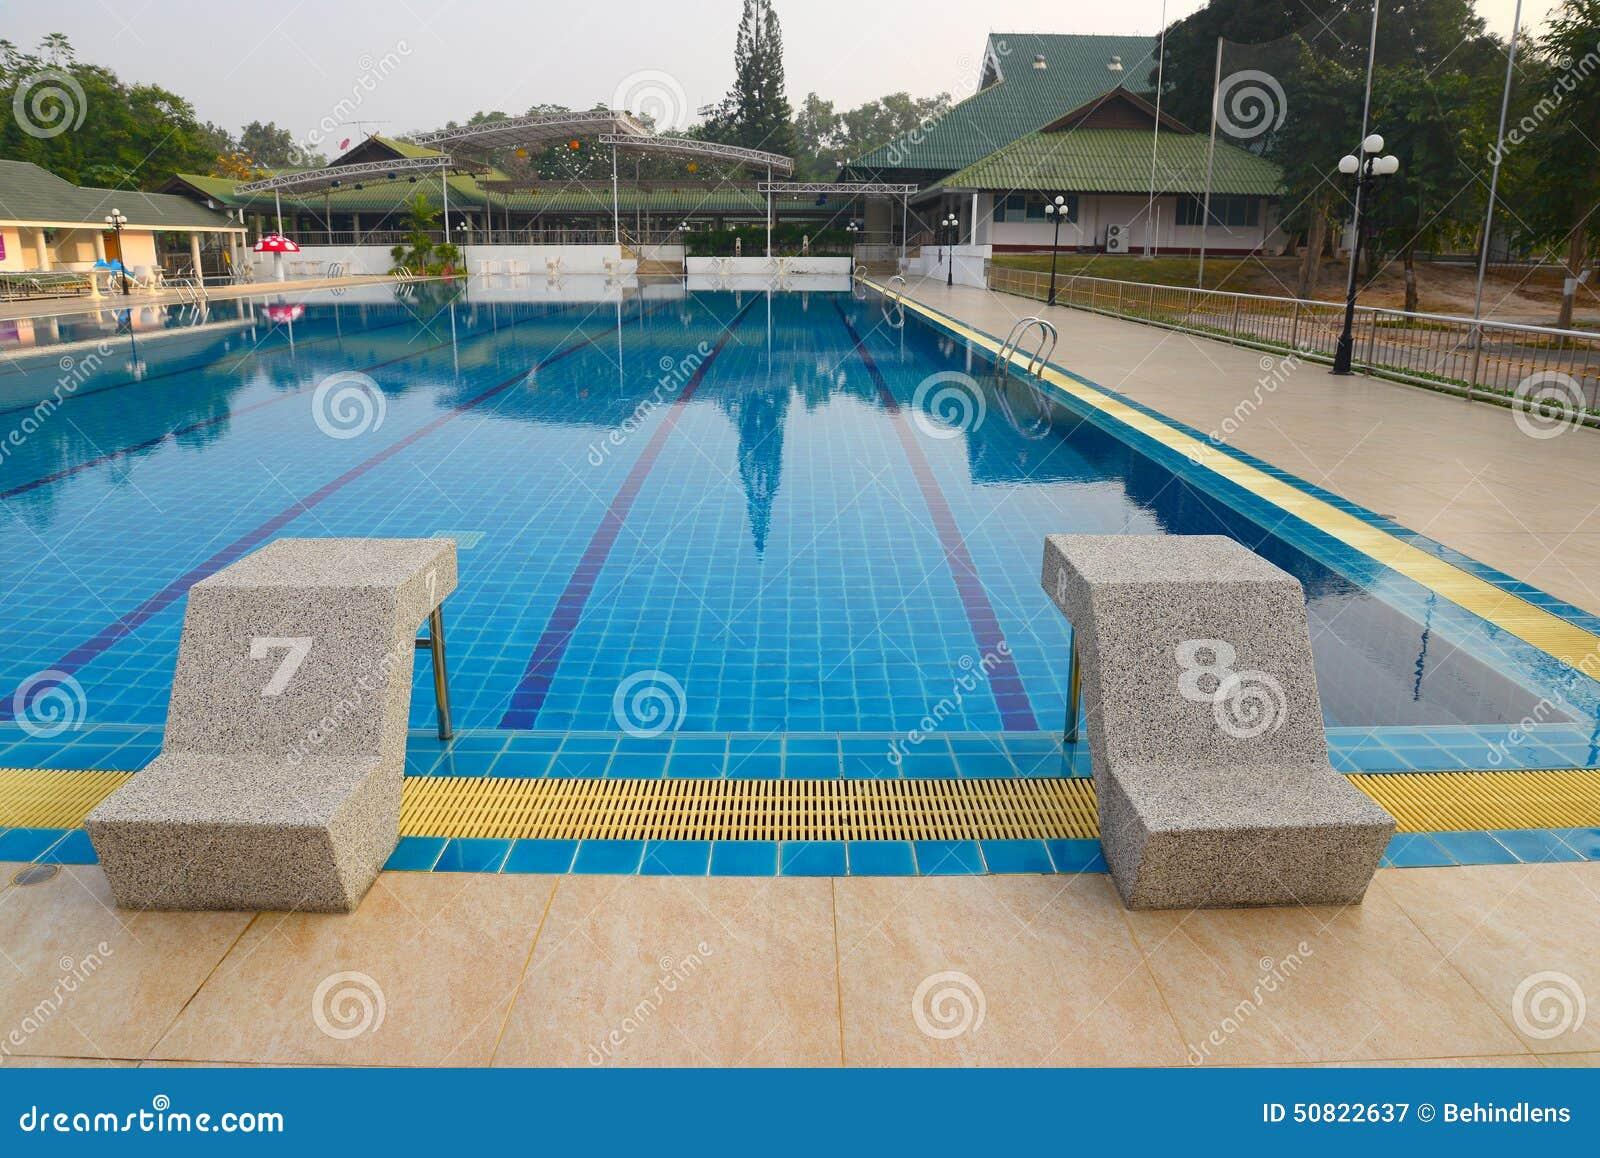 Swimming Pool Stock Photo Image 50822637